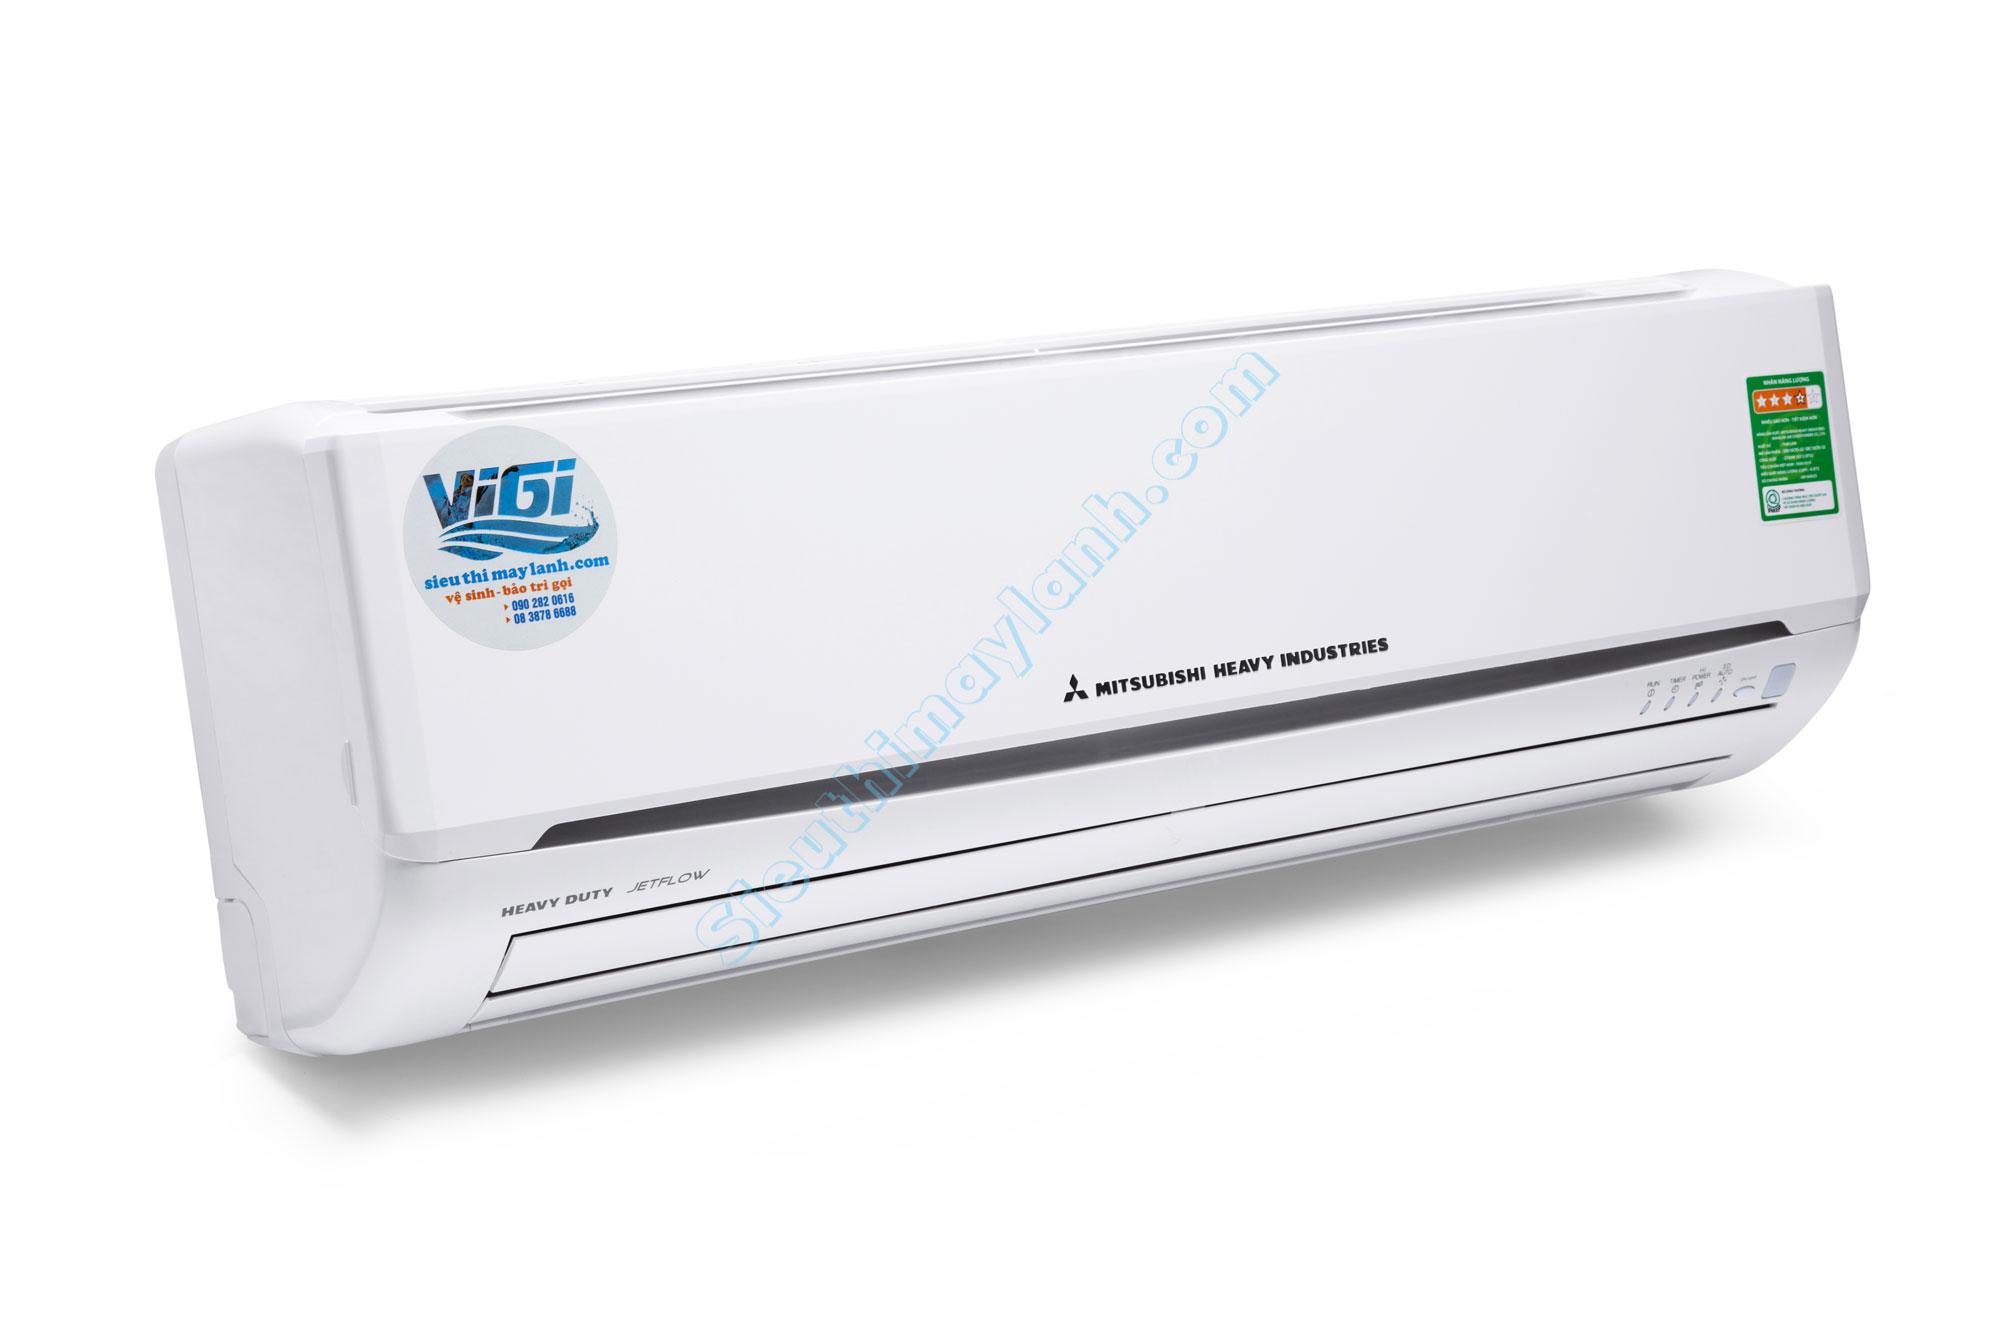 heat remote conditioner ton multi p ductless zone gree btu split mitsubishi air with inverter mini splits volt